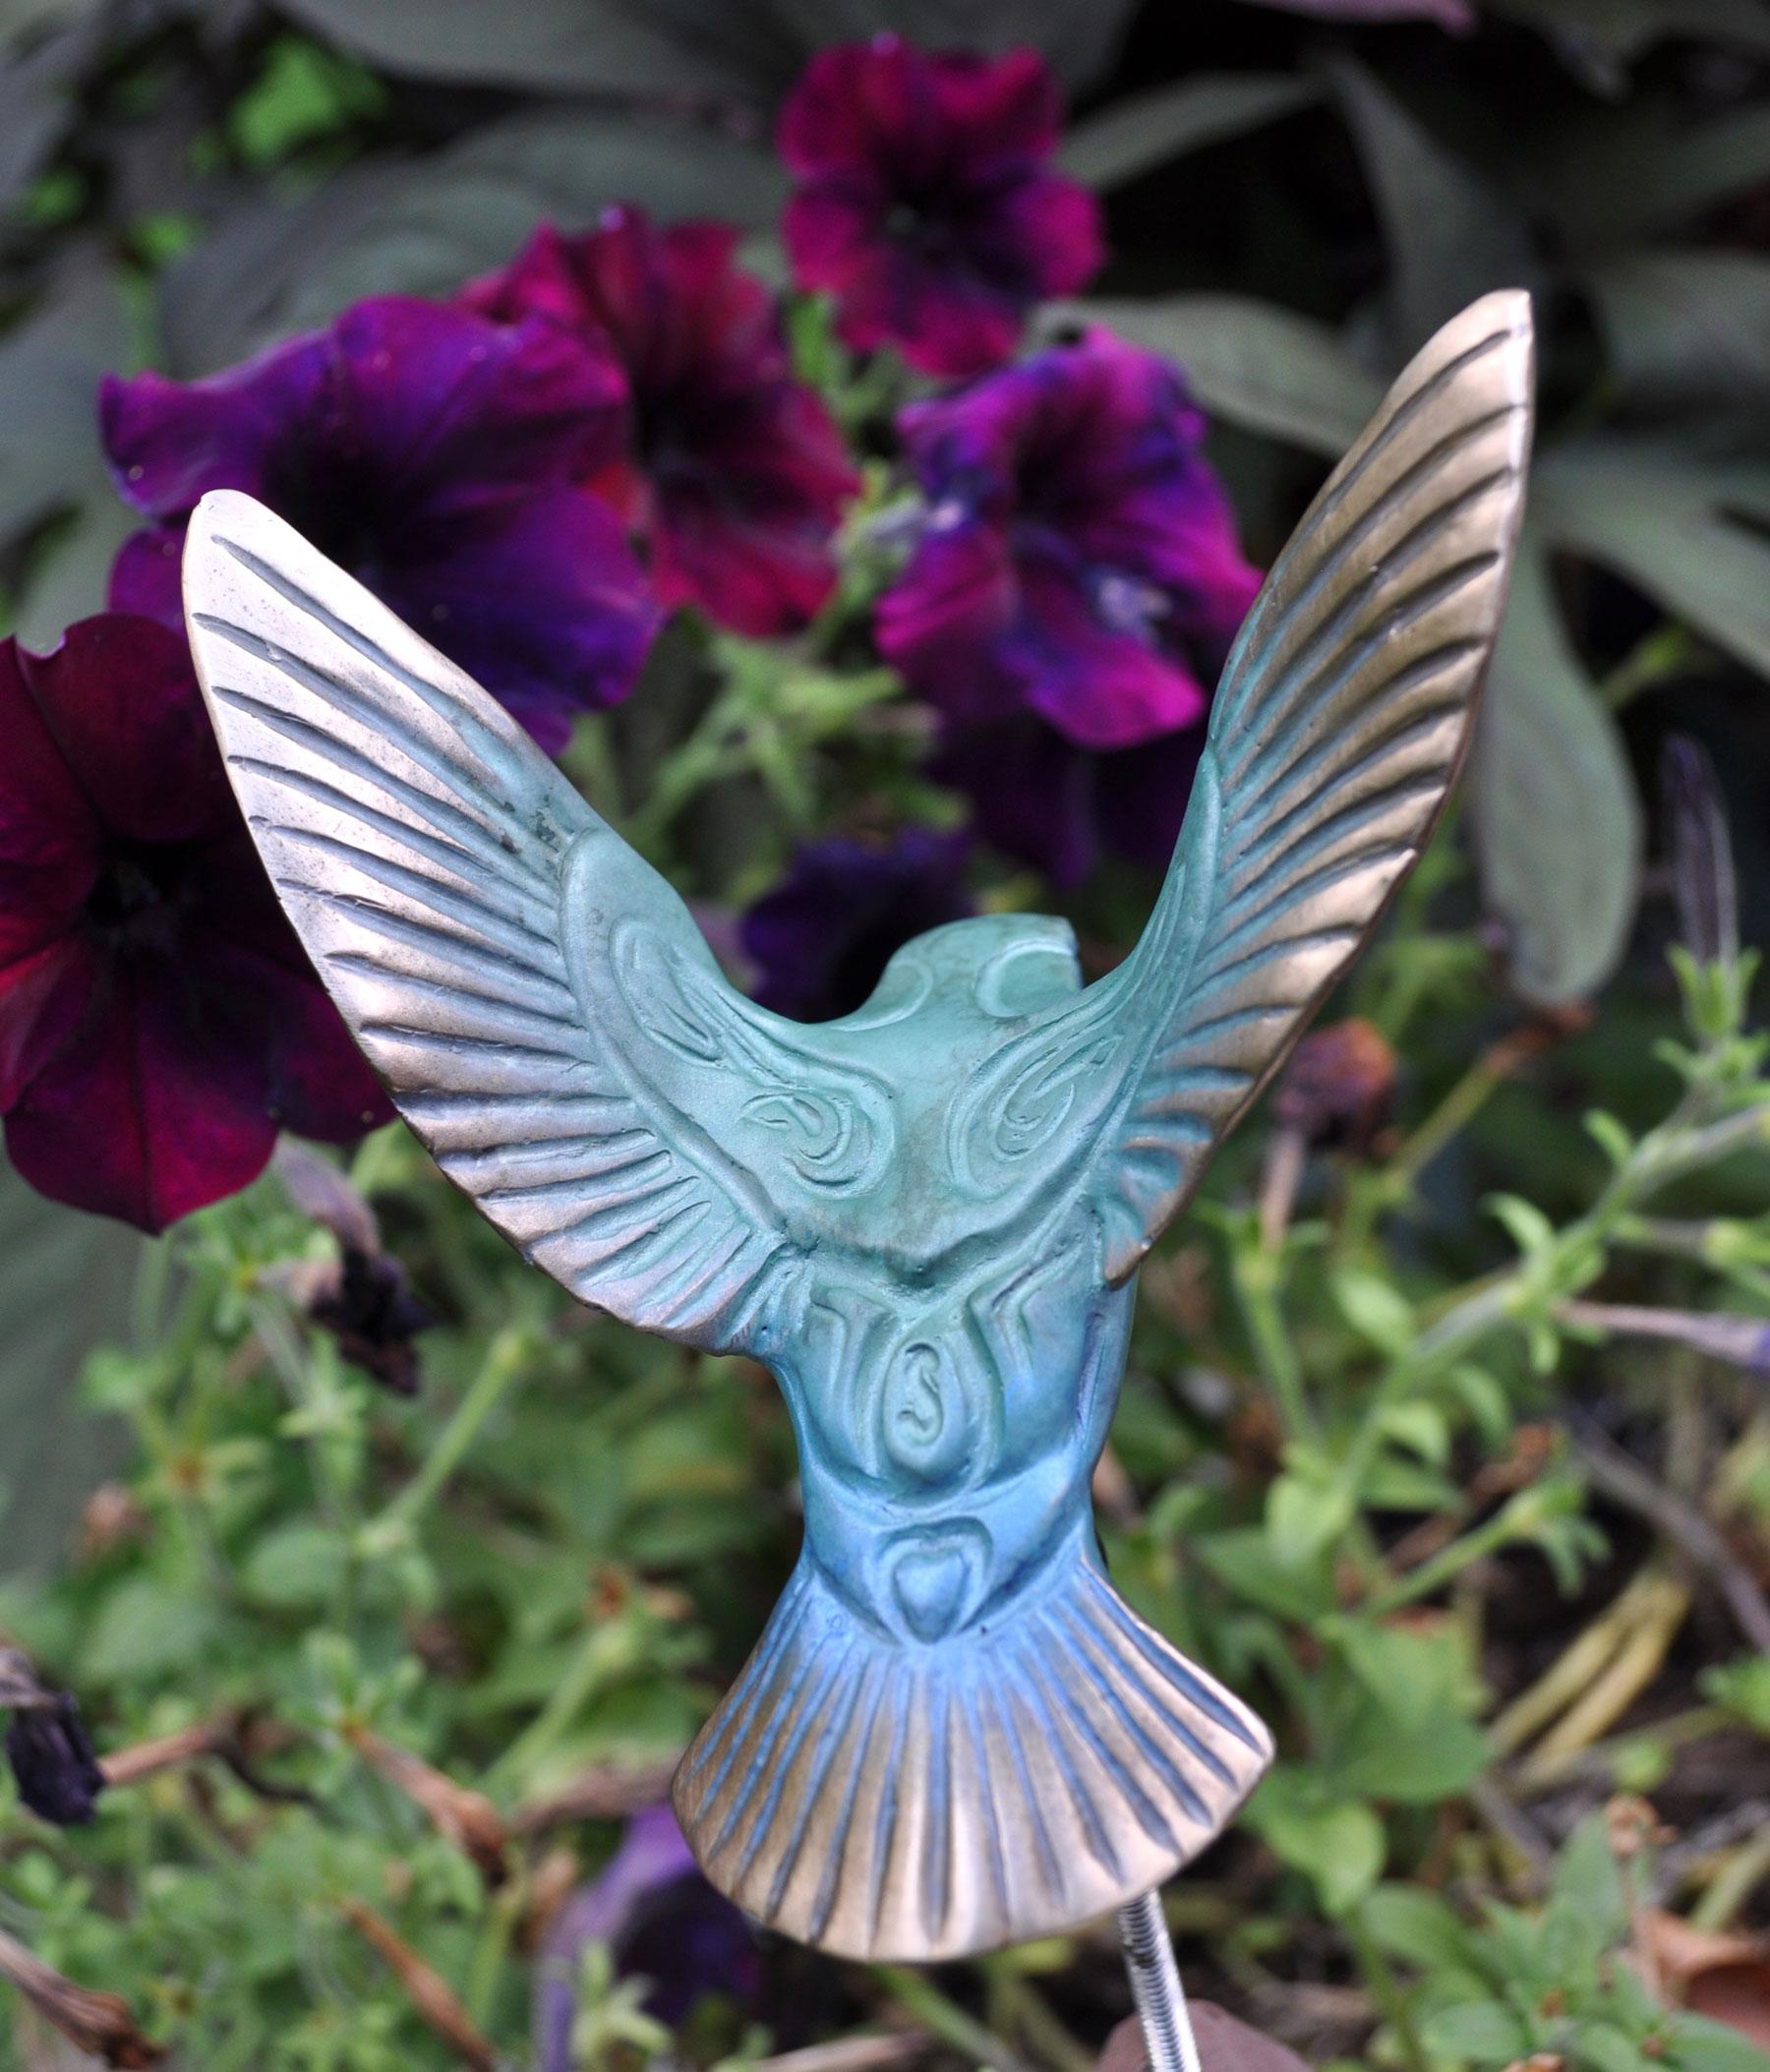 bronze-hummingbird-sculpture-john-maisano-6.jpg